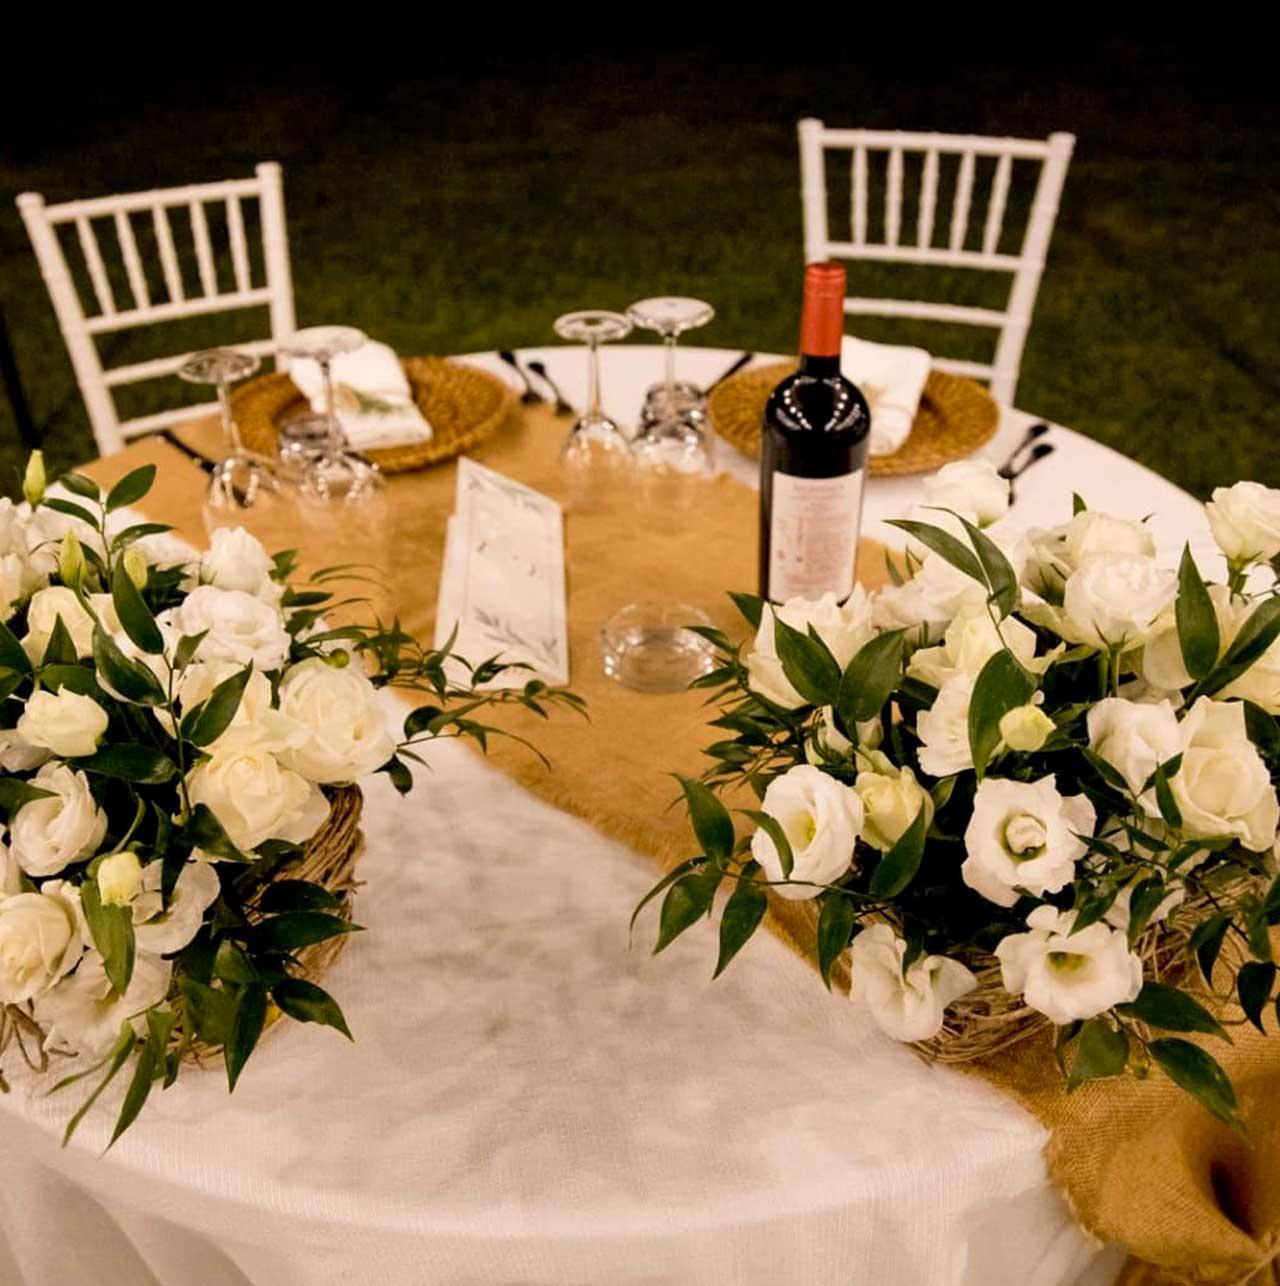 tenuta-sica-wedding-catering